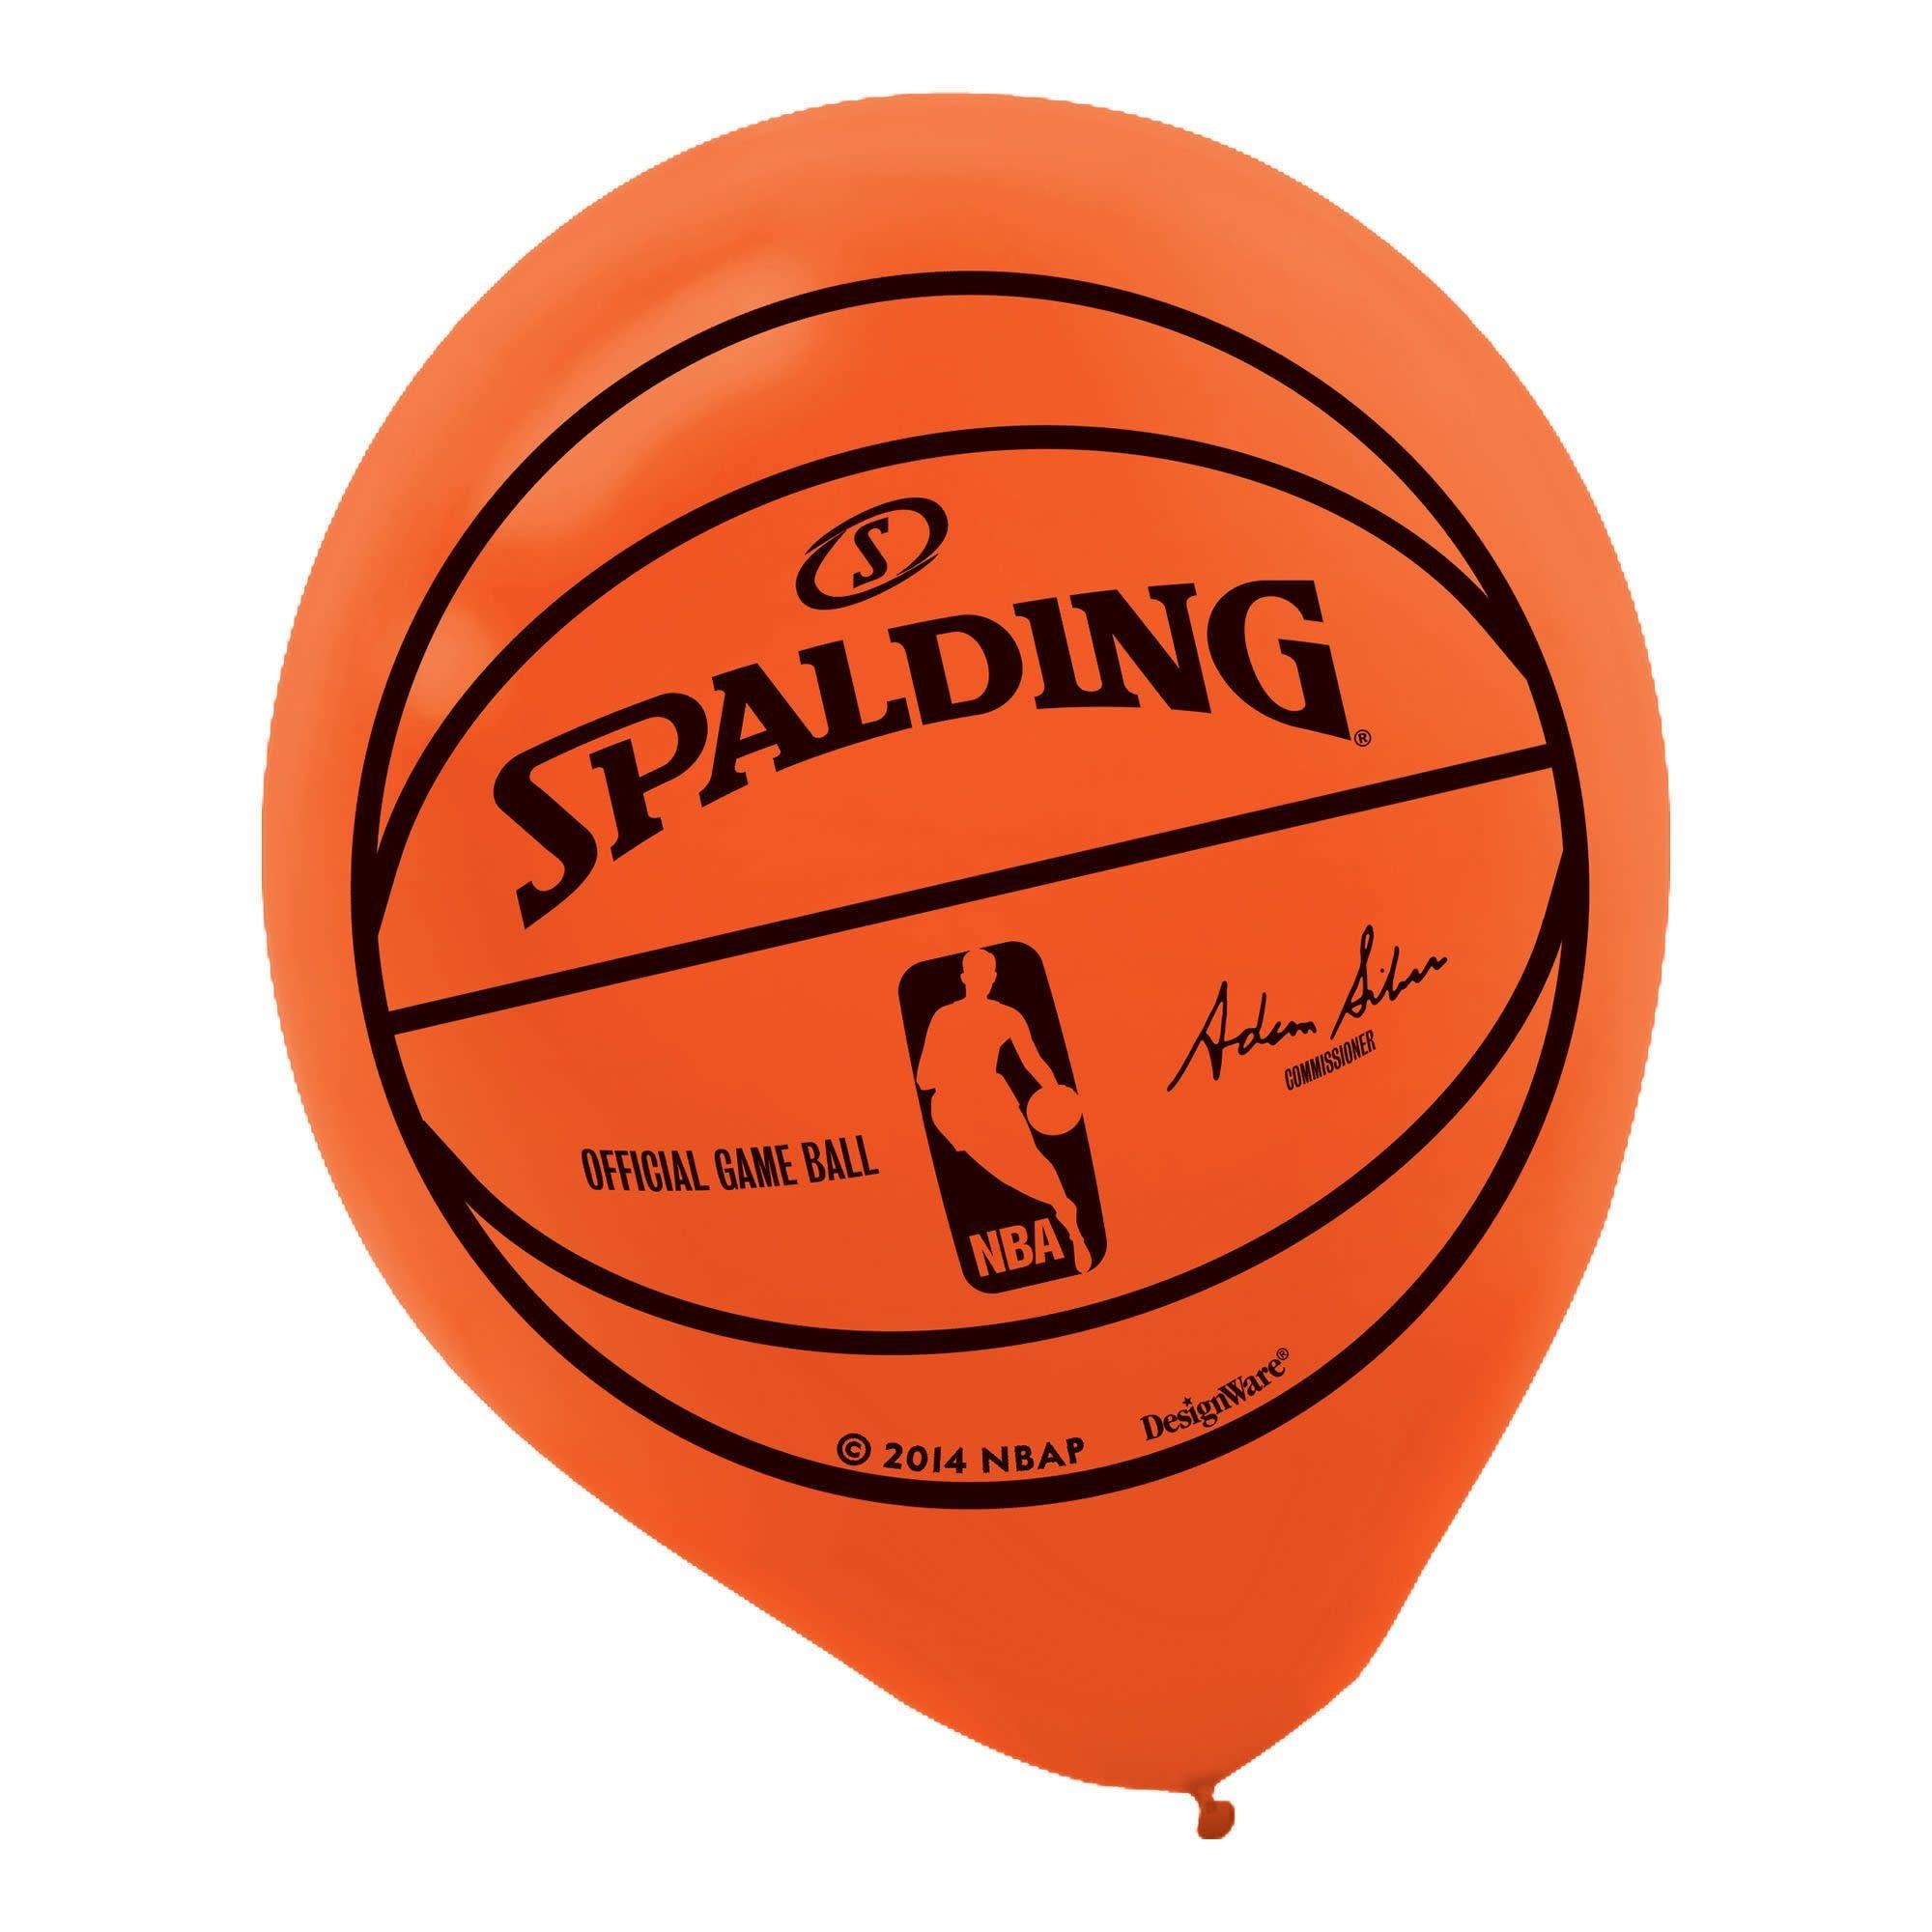 Spalding Basketball Printed Latex Balloons (Latex Only)